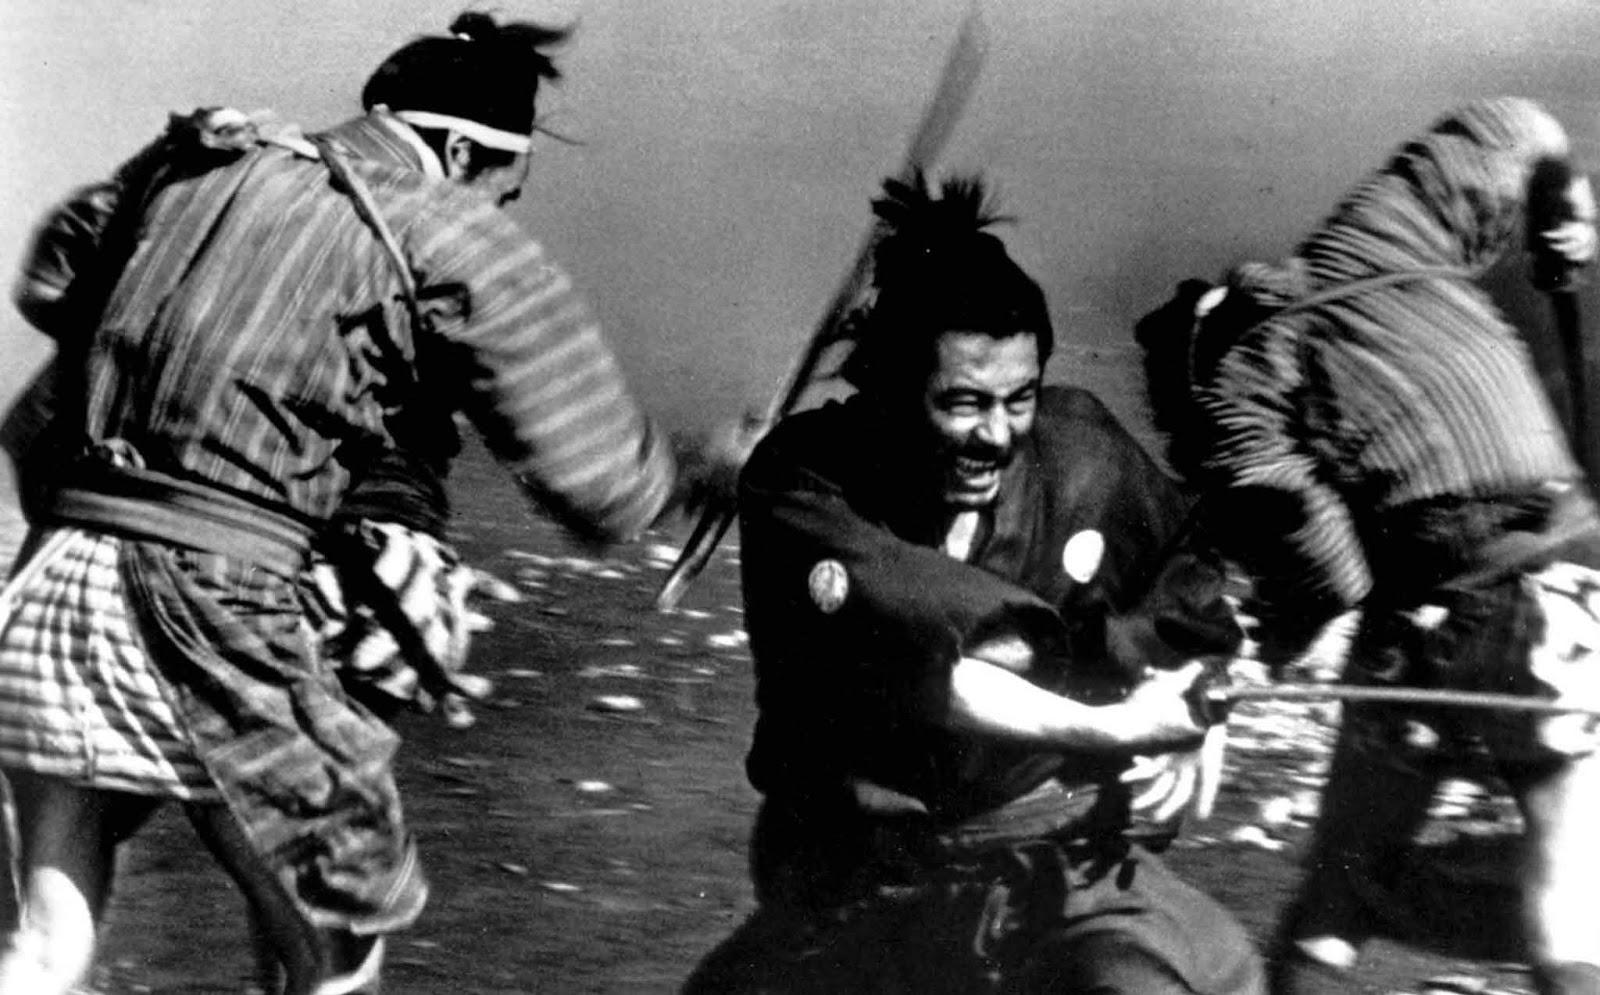 Yojimbo Kurosawa